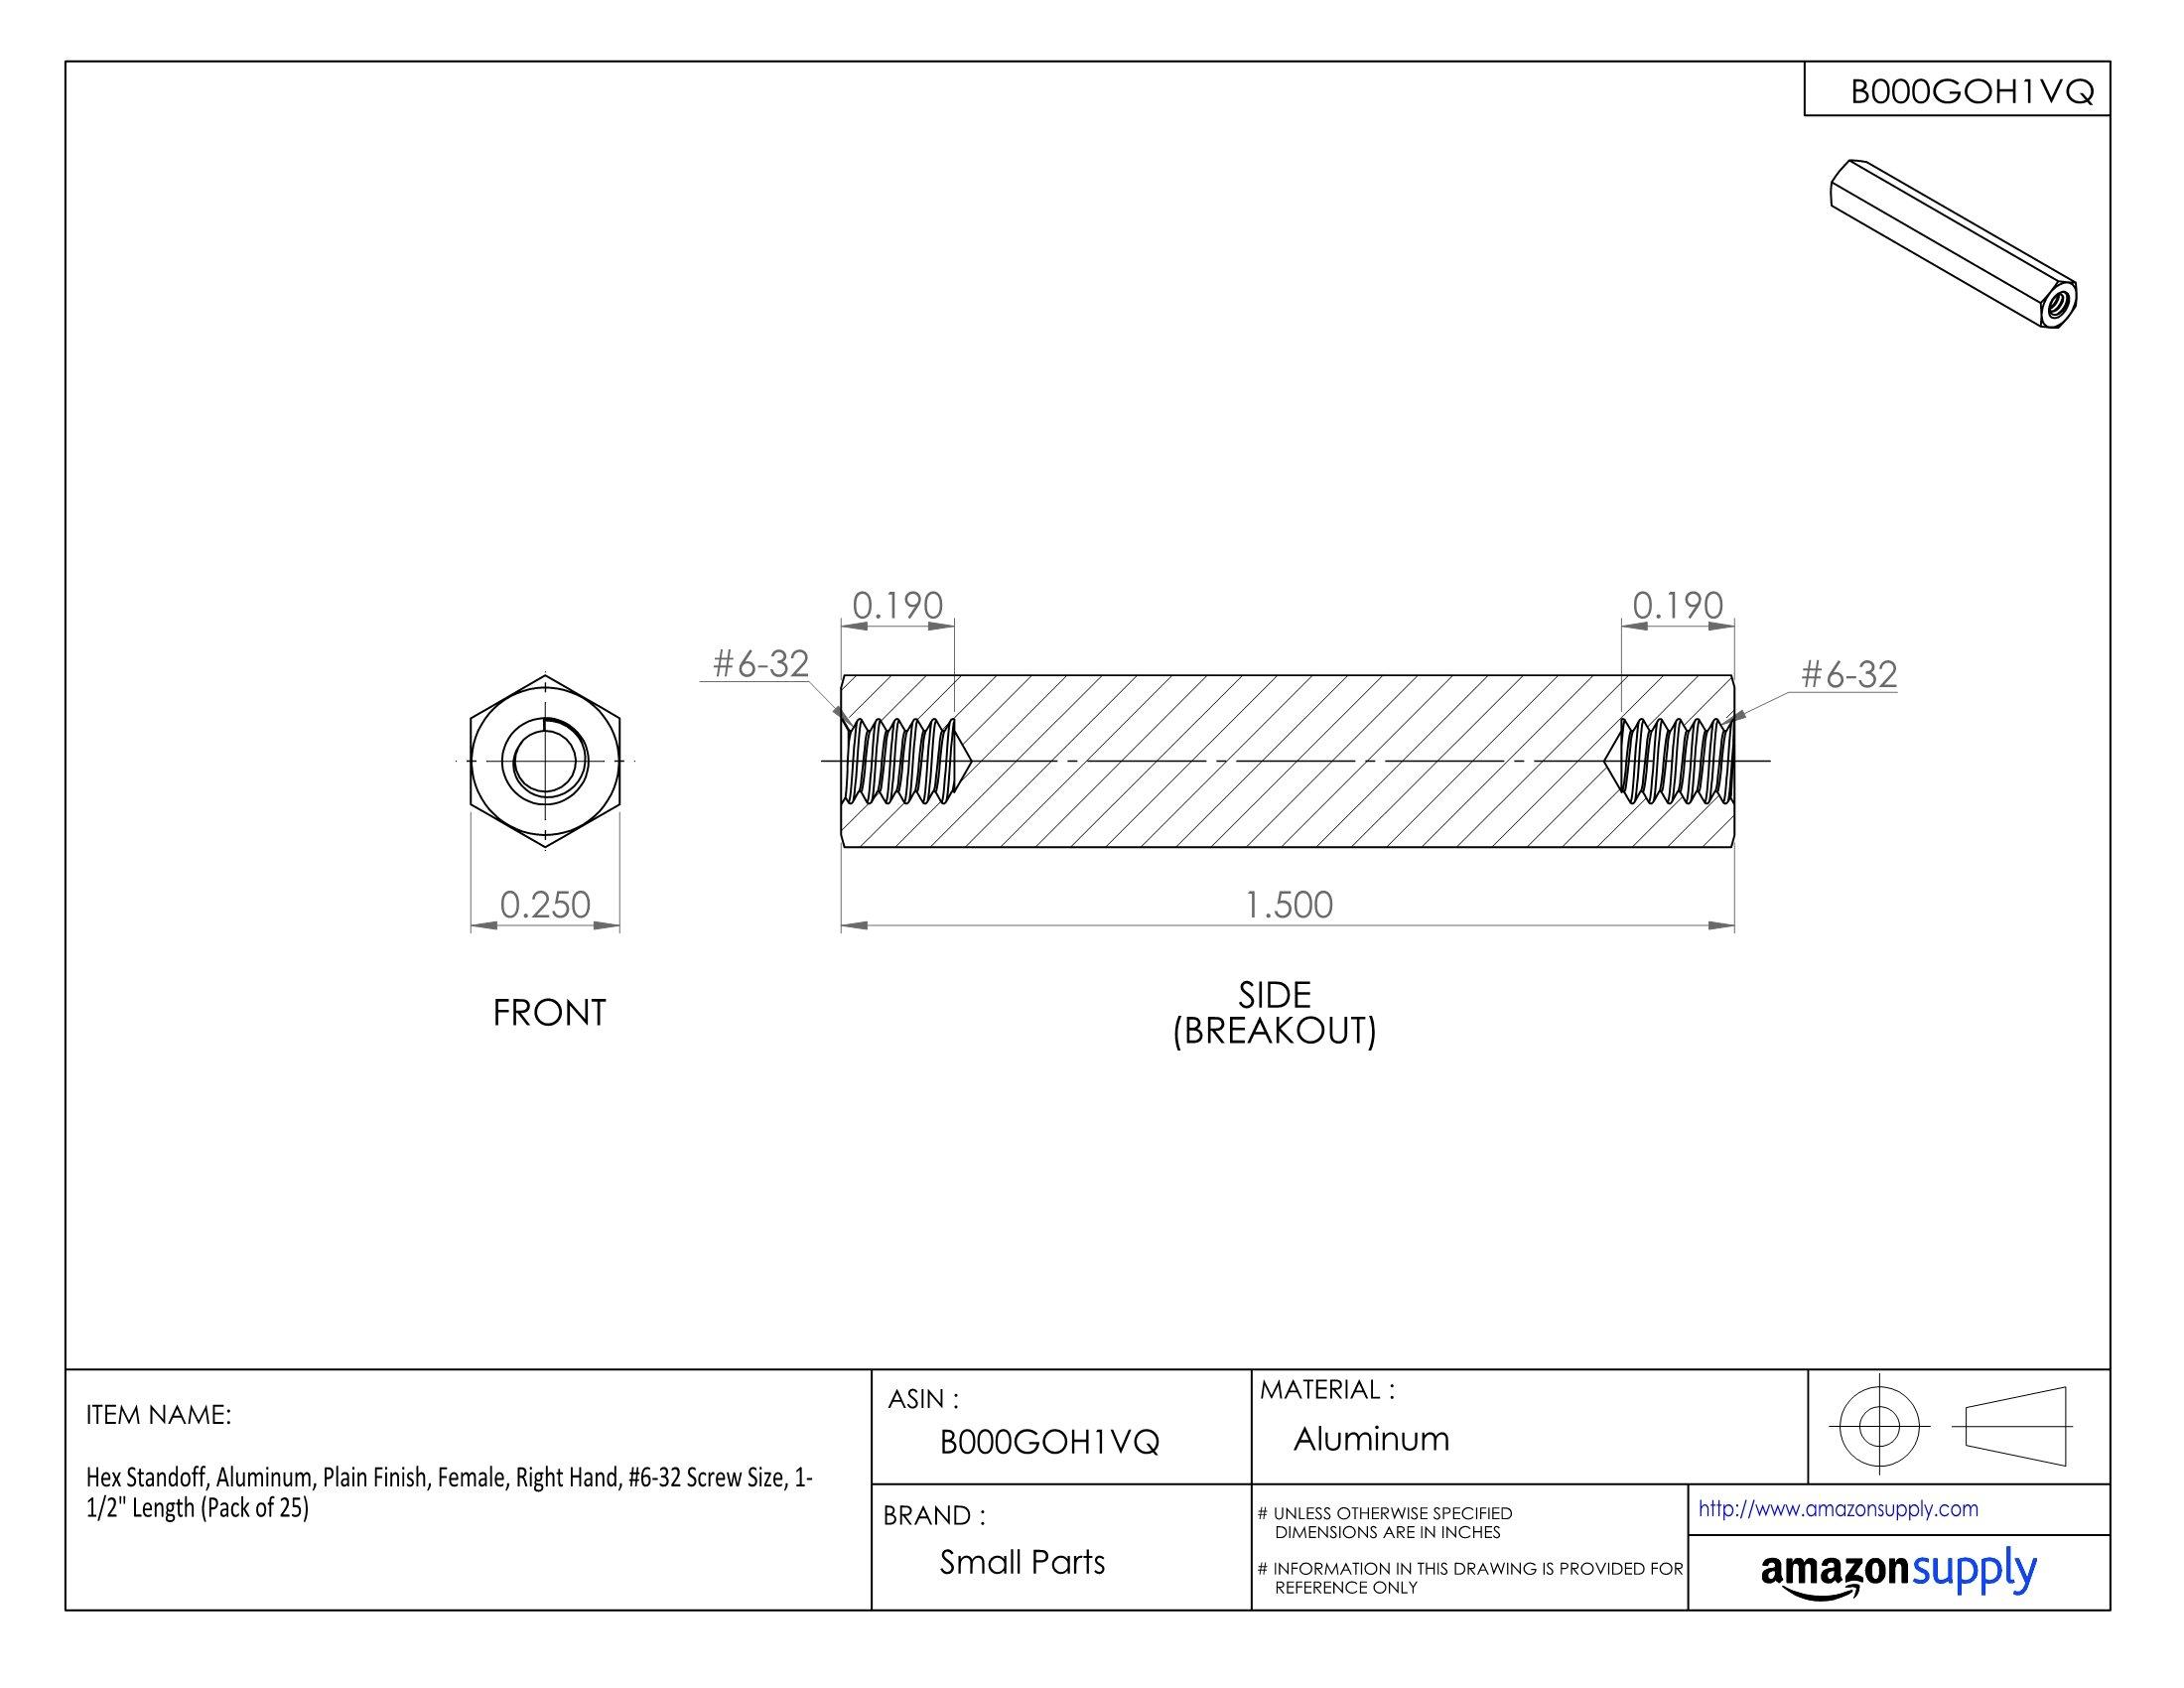 Hex Standoff, Aluminum, Plain Finish, Female, Right Hand, #6-32 Screw Size, 1-1/2'' Length (Pack of 25)